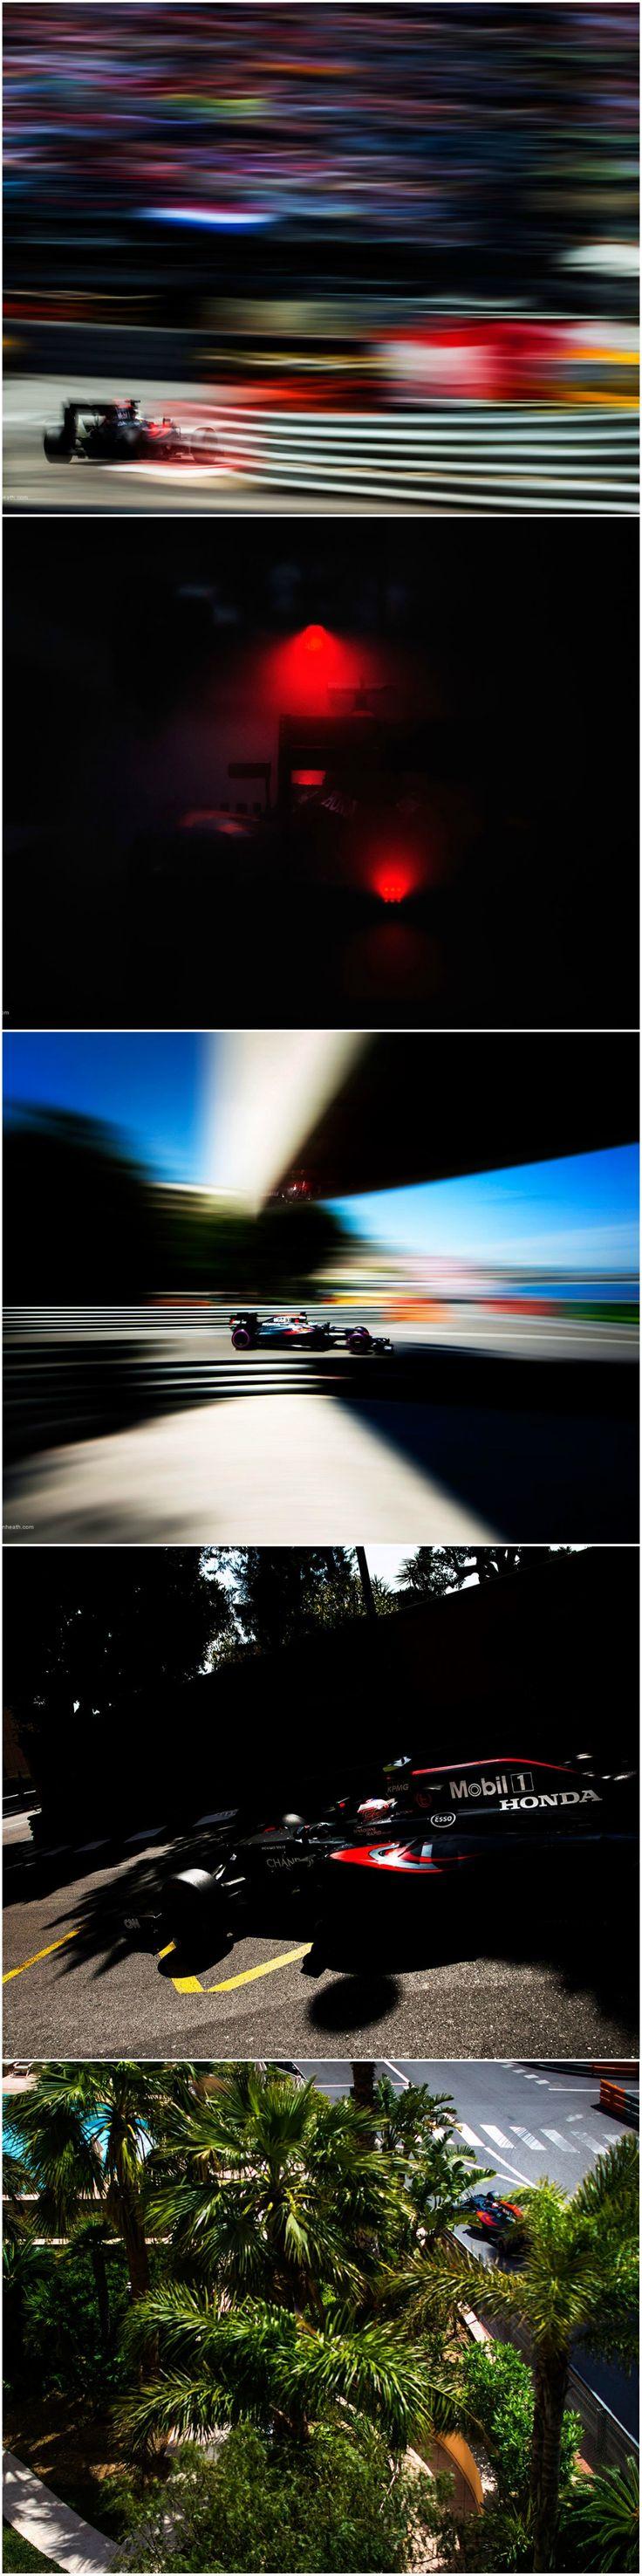 The 2016 Monaco GP in pictures, by F1 photographer, Darren Heath